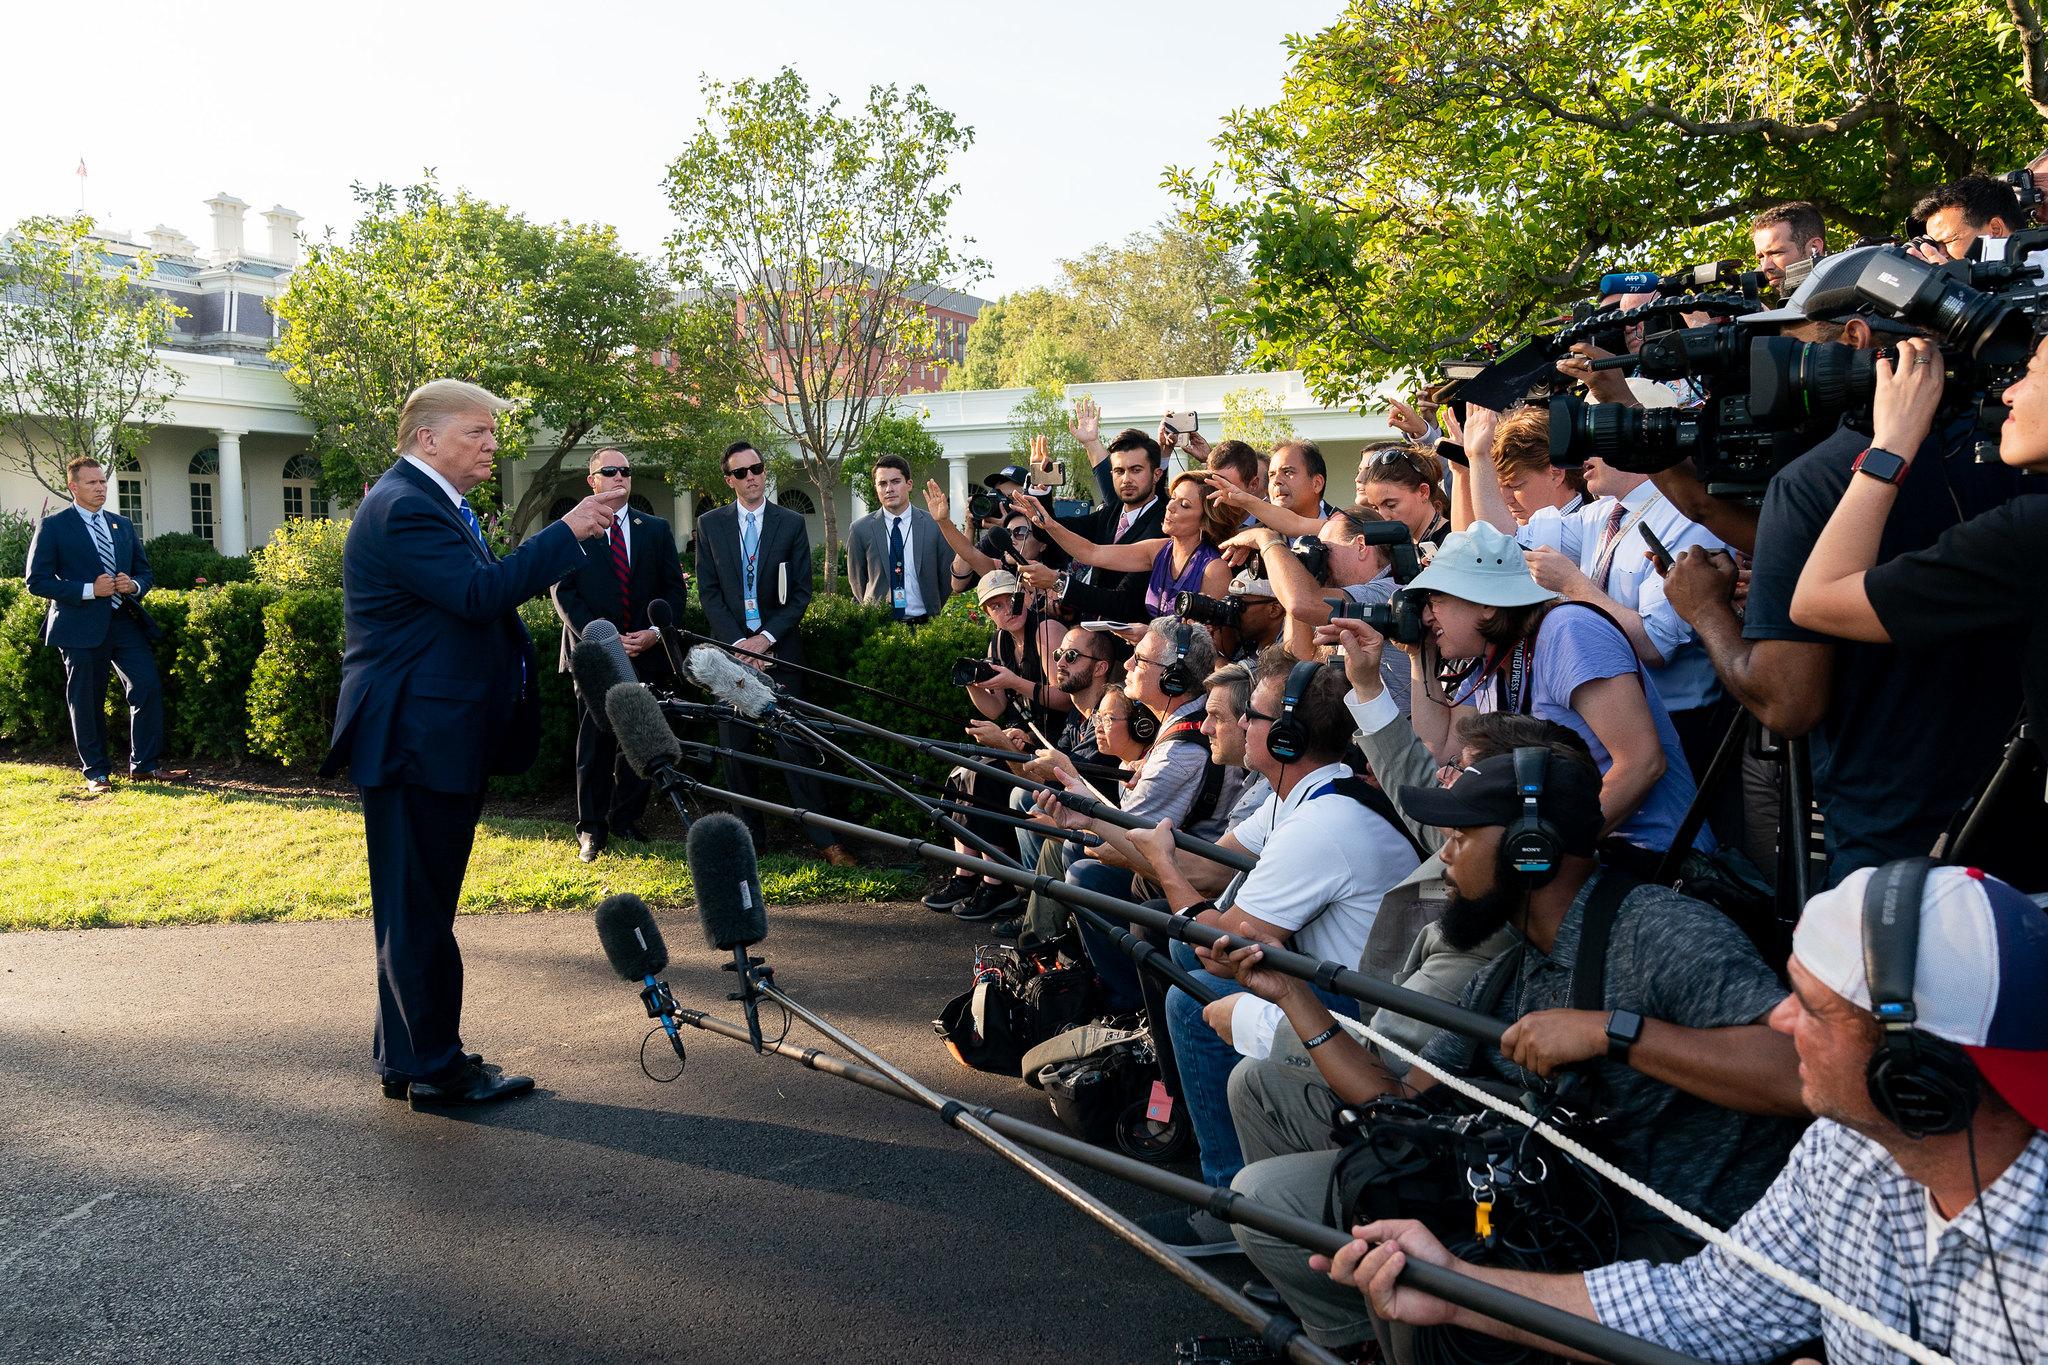 Paul Craig Roberts: I Feel Sorry for President Trump